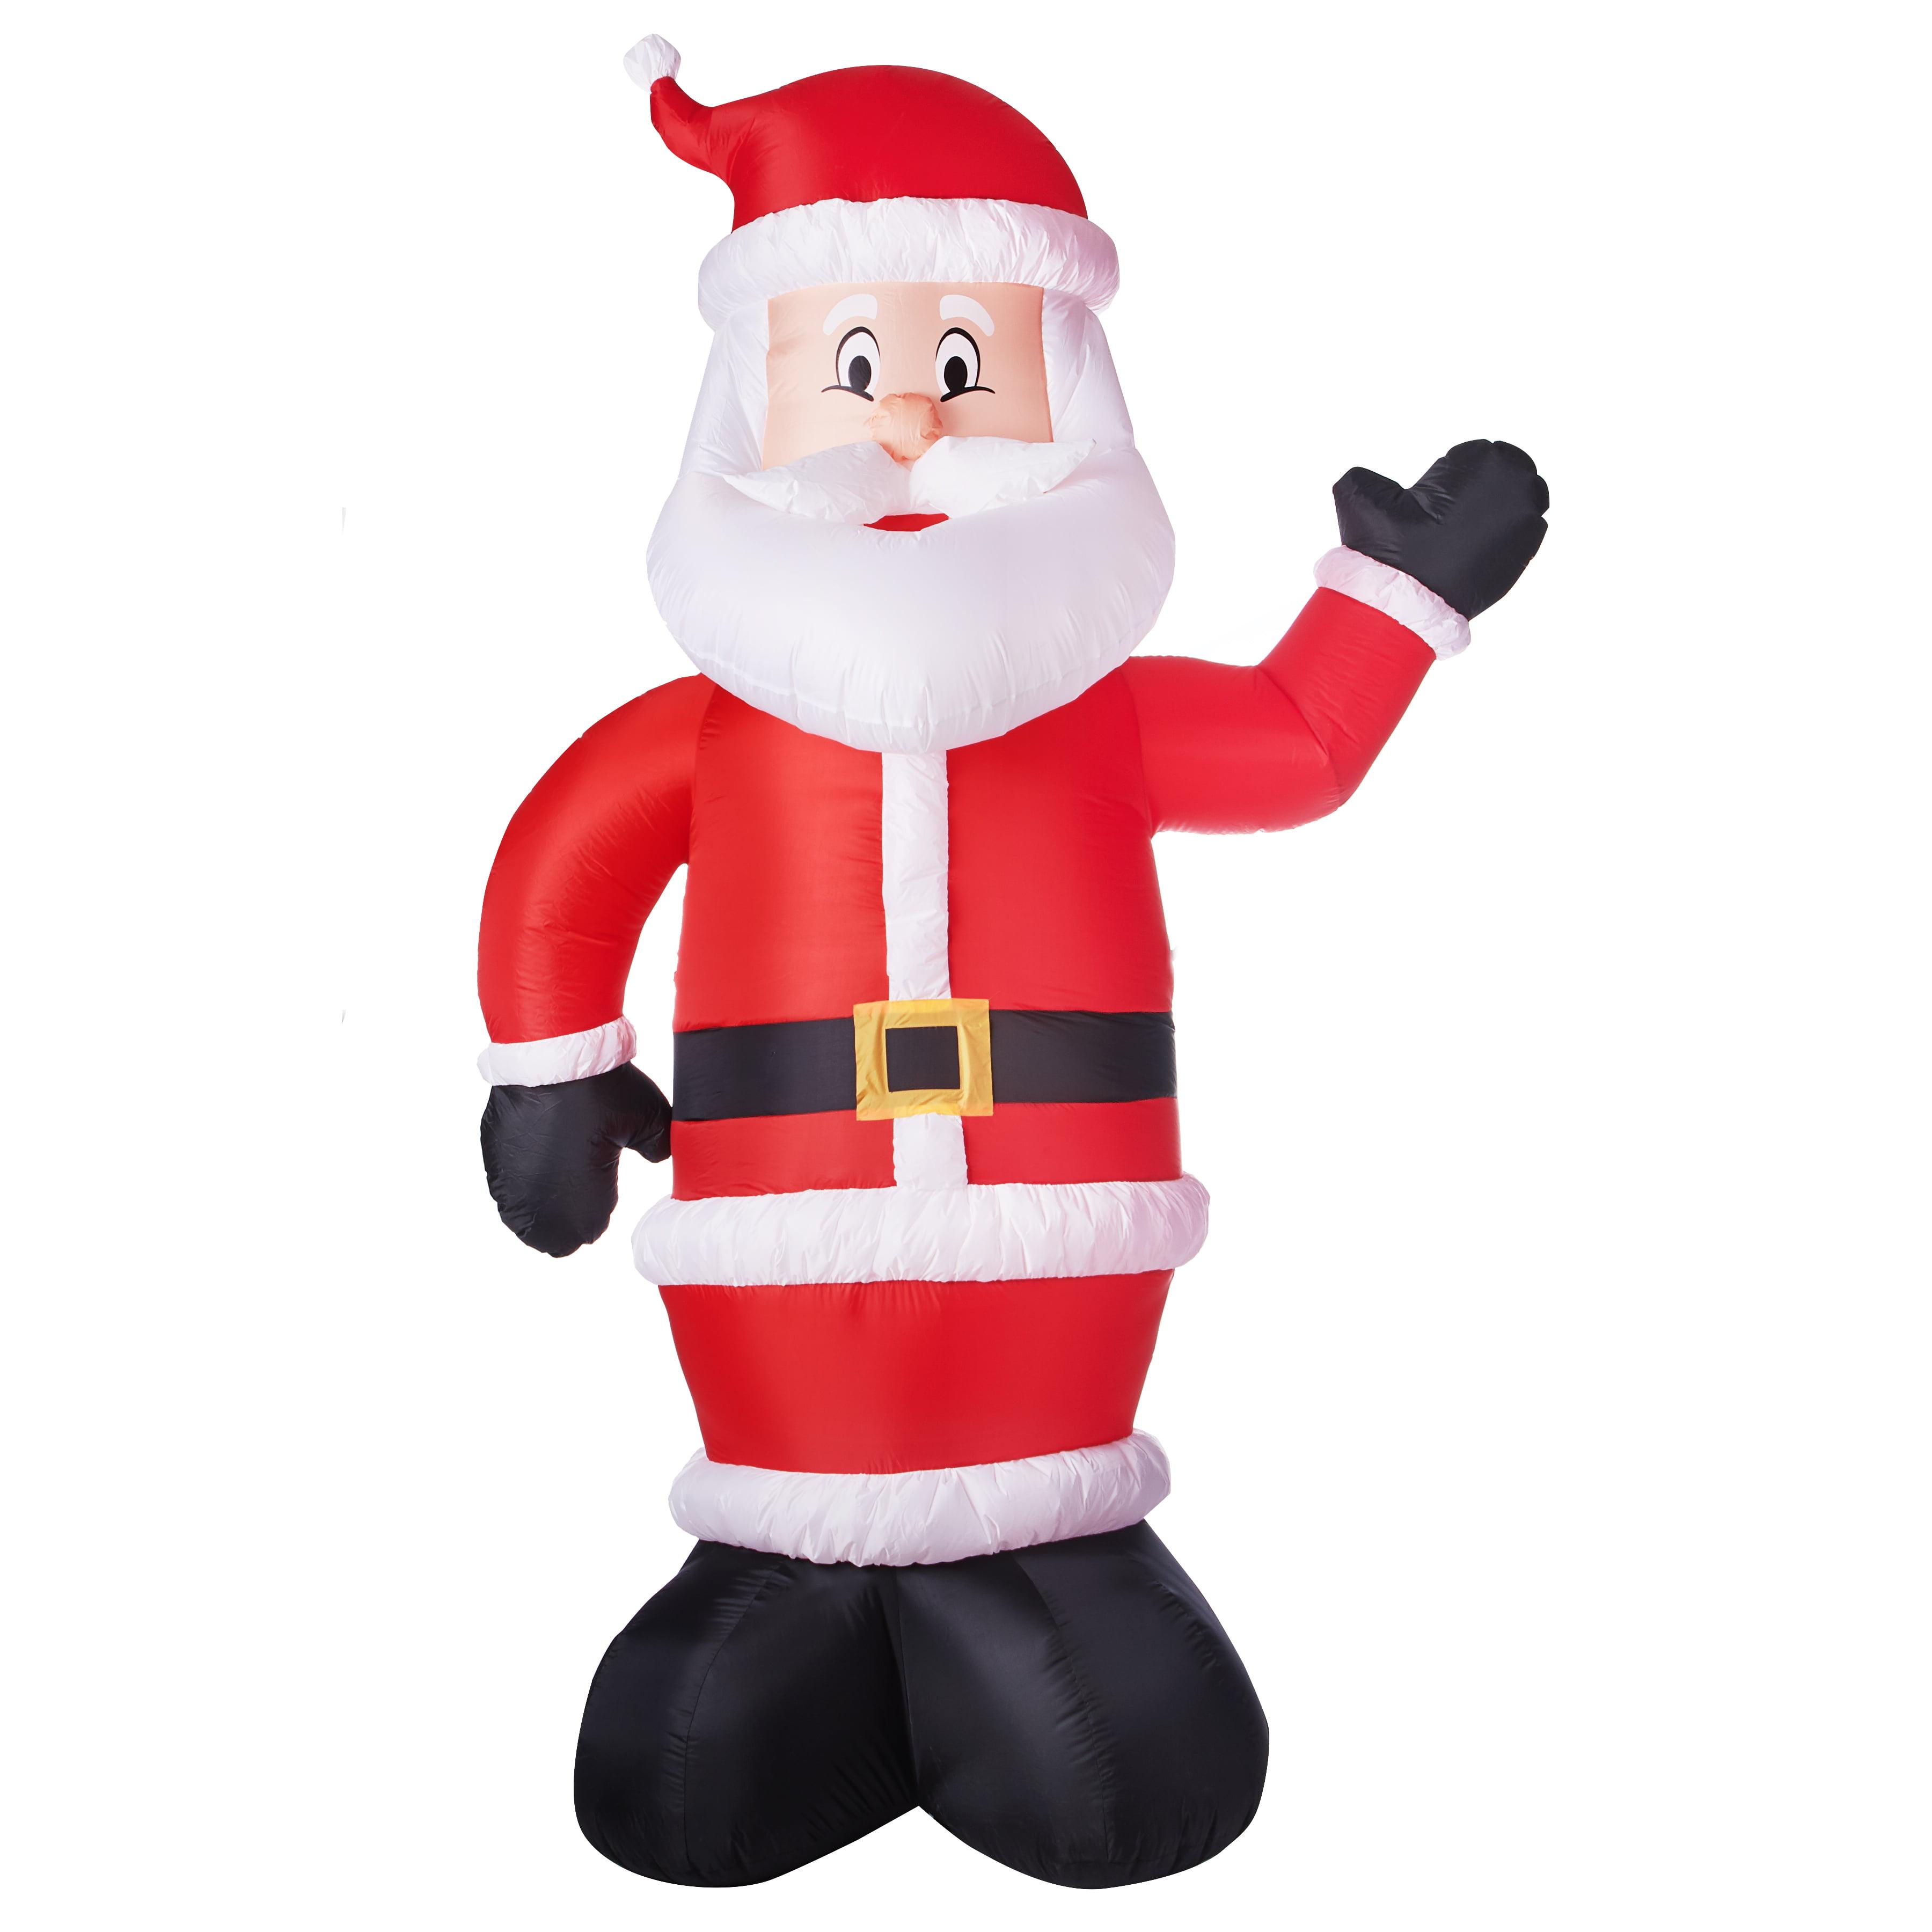 Christmas Inflatables - Walmart.com